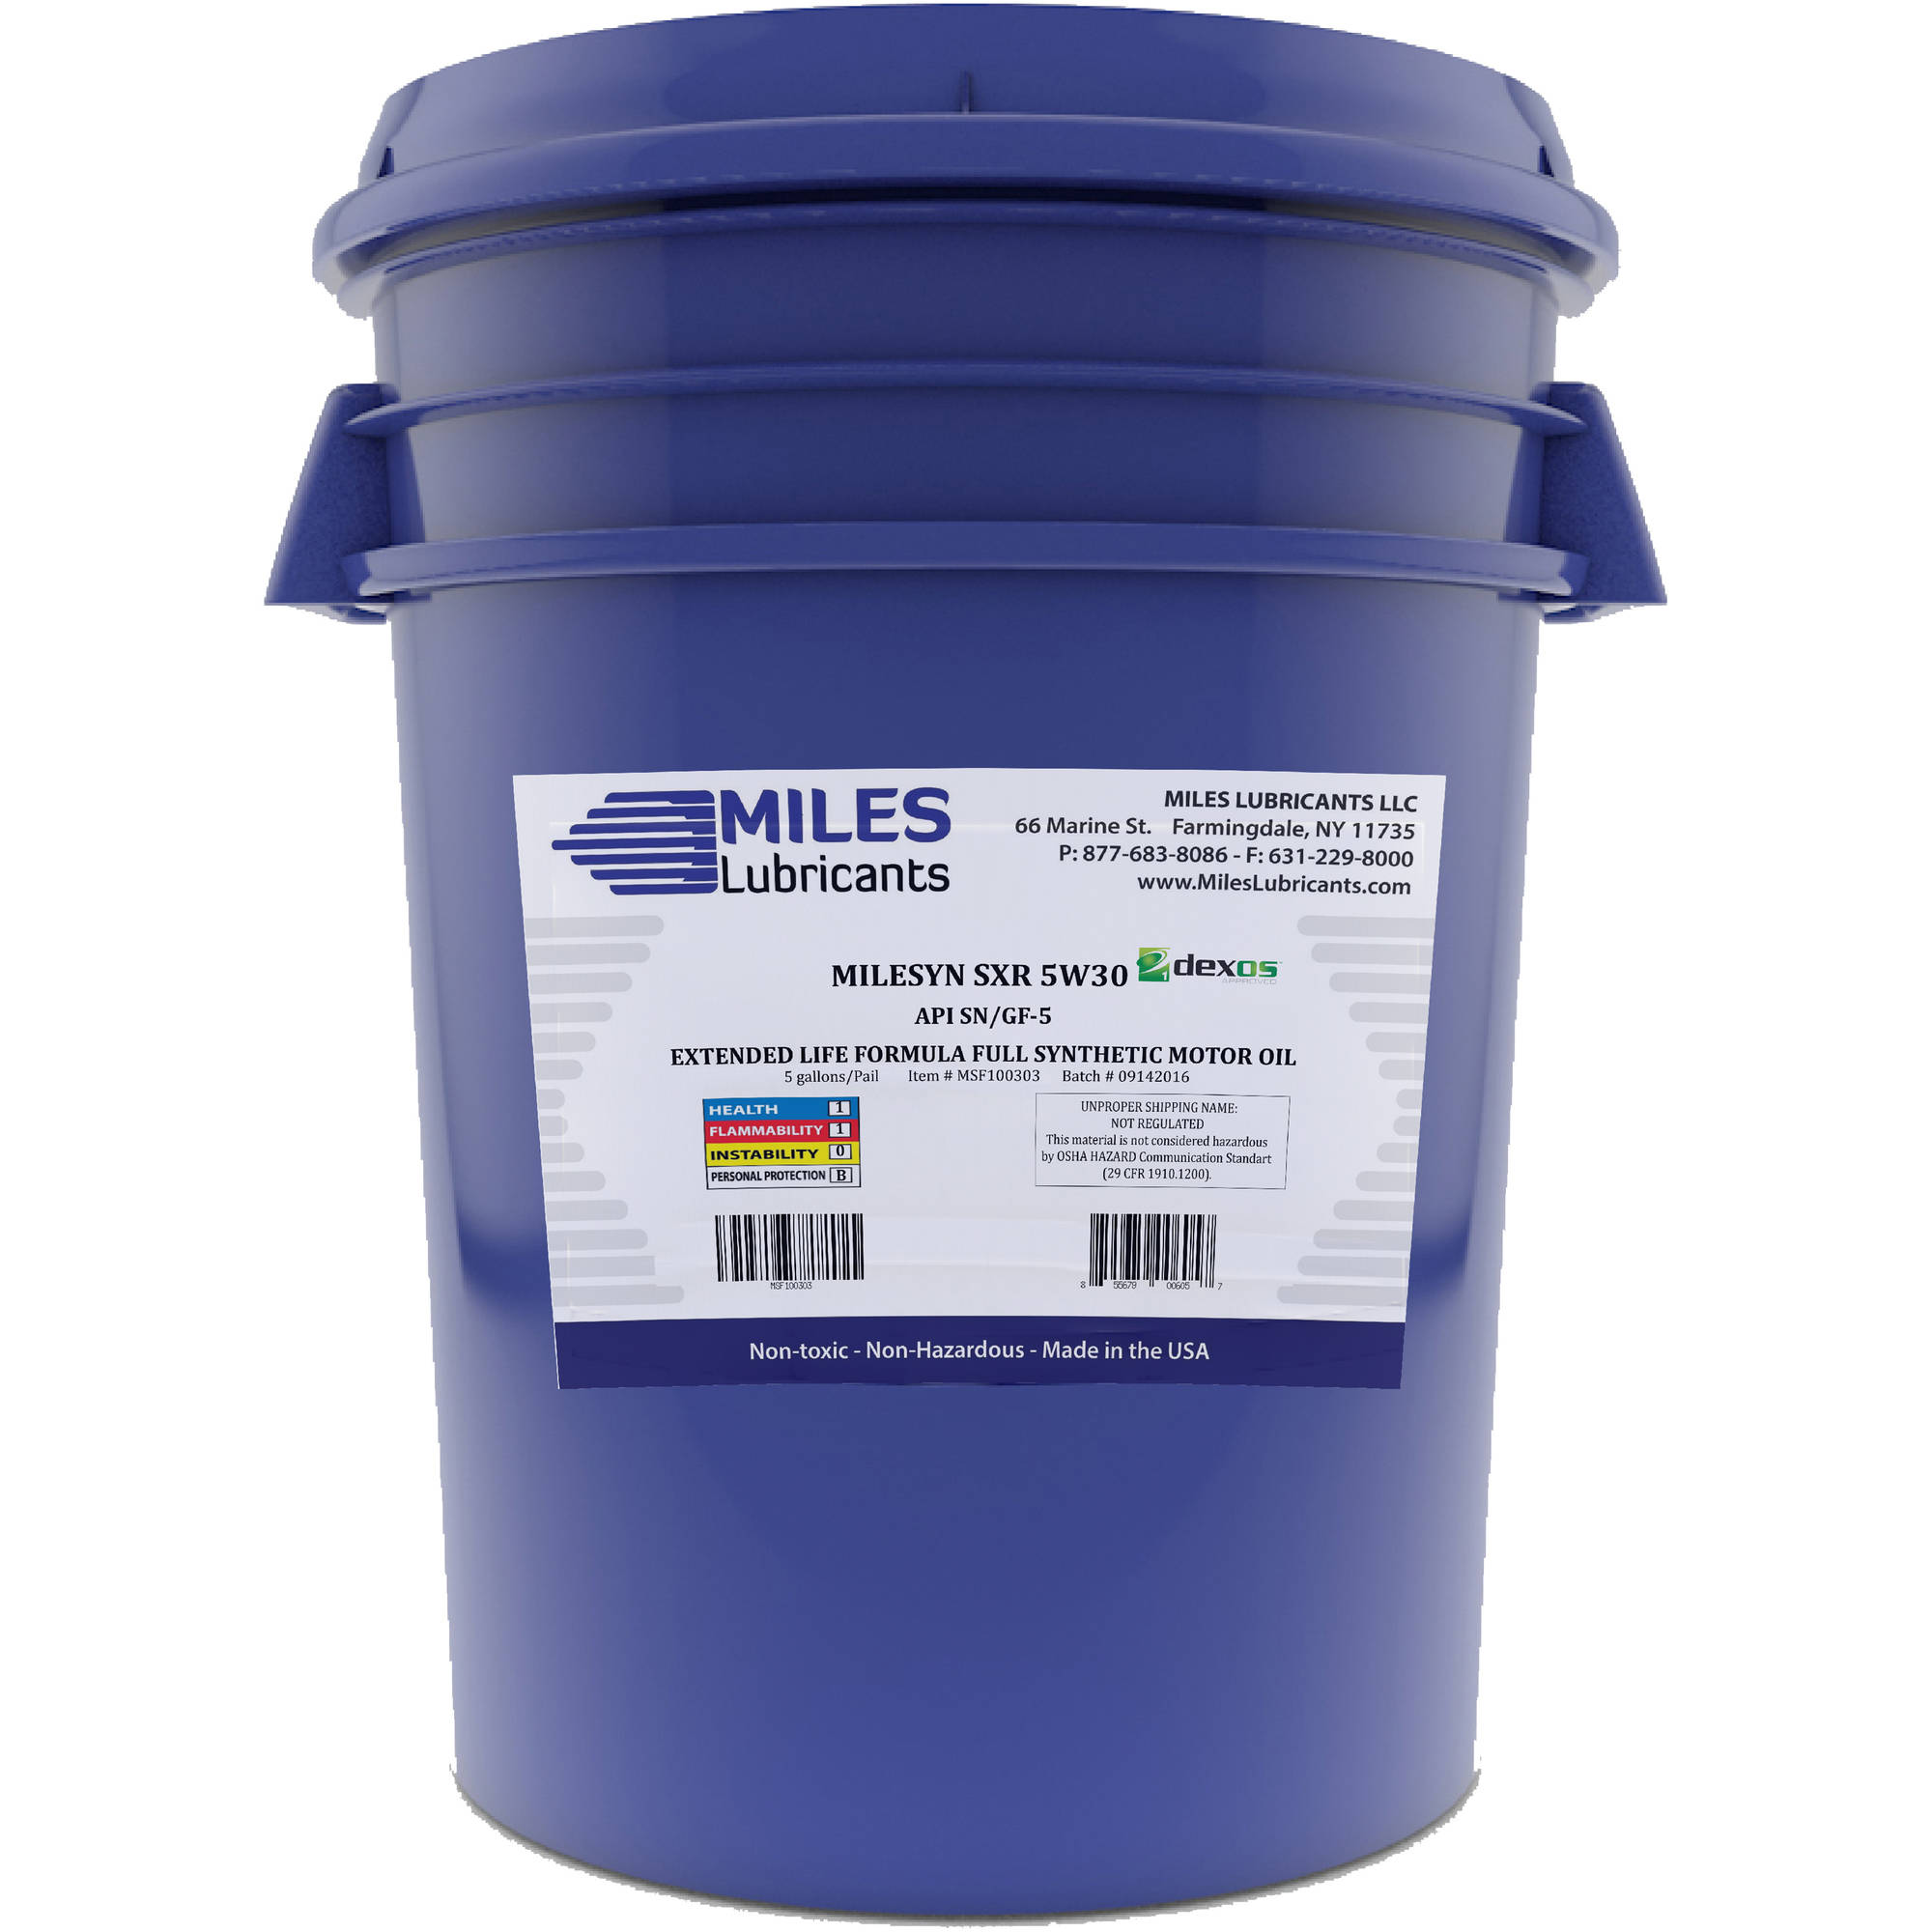 Milesyn SXR 5W30 API GF-5/SN, Dexos1, Full Synthetic Motor Oil, 5-Gallon Pail